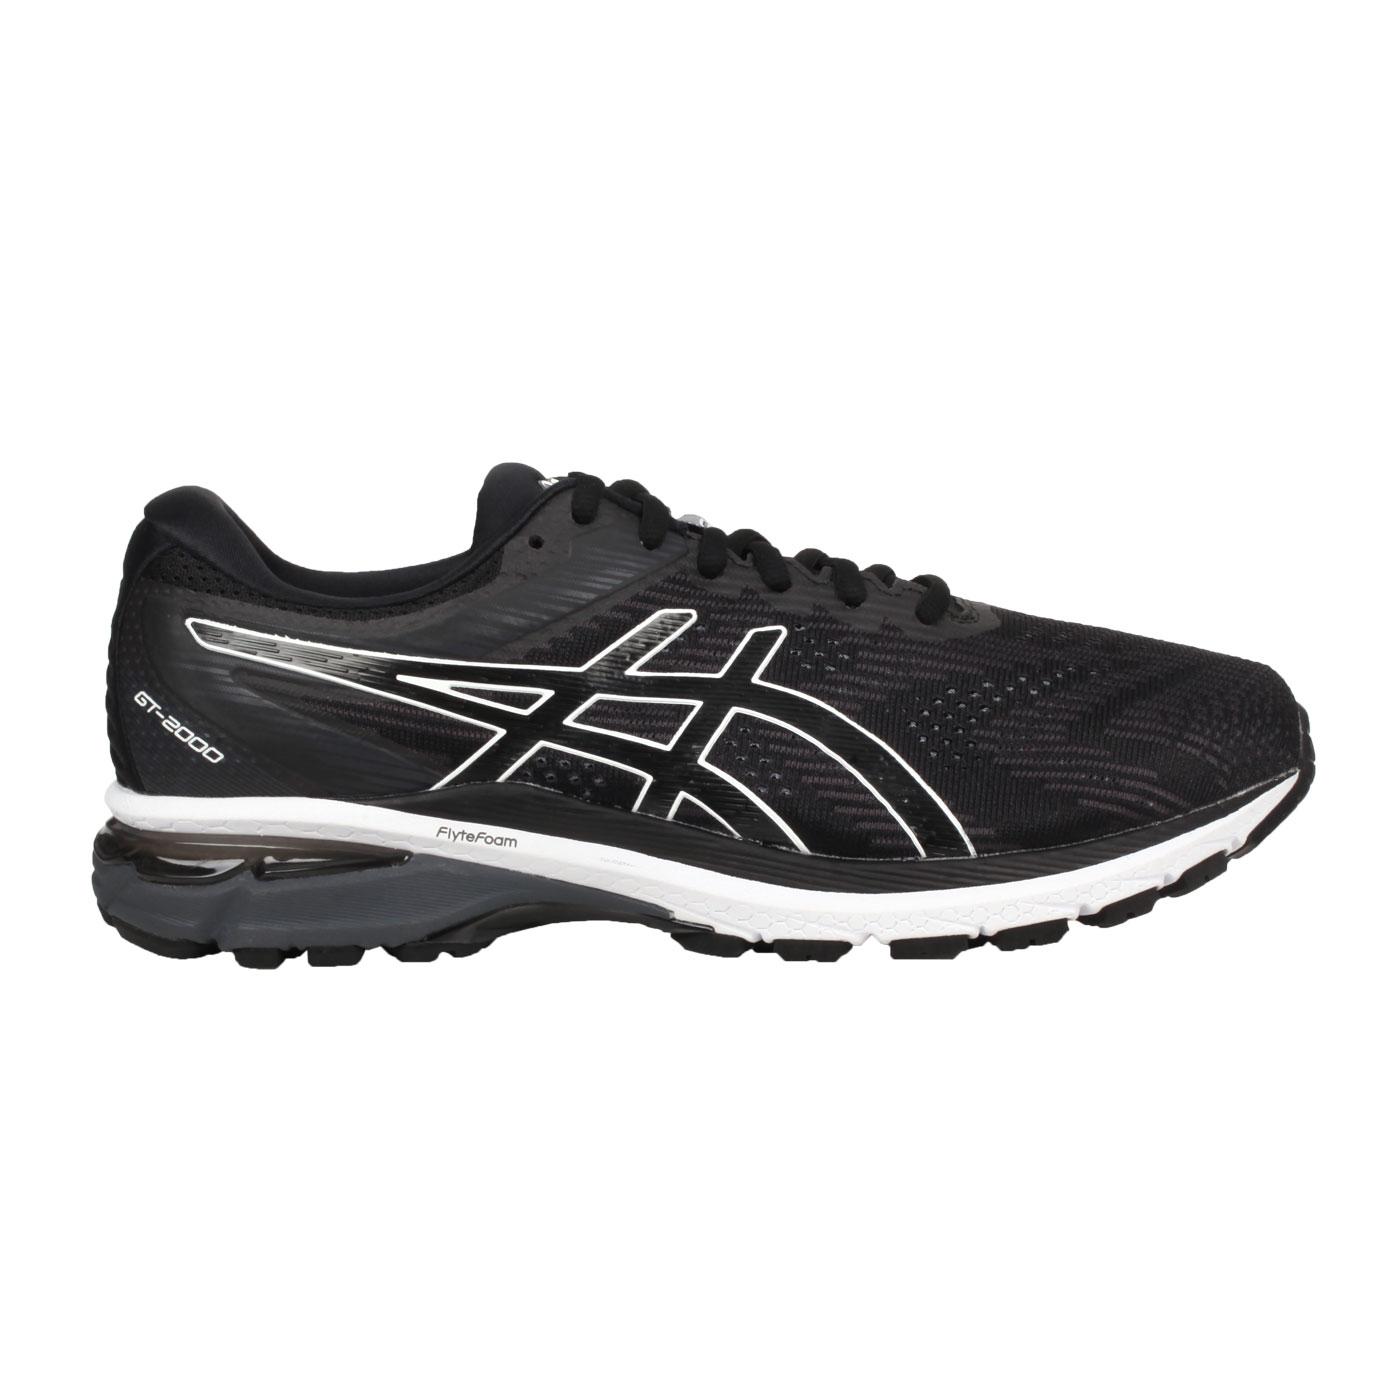 ASICS 男款慢跑鞋-4E  @GT-2000 8@1011A688-002 - 黑白